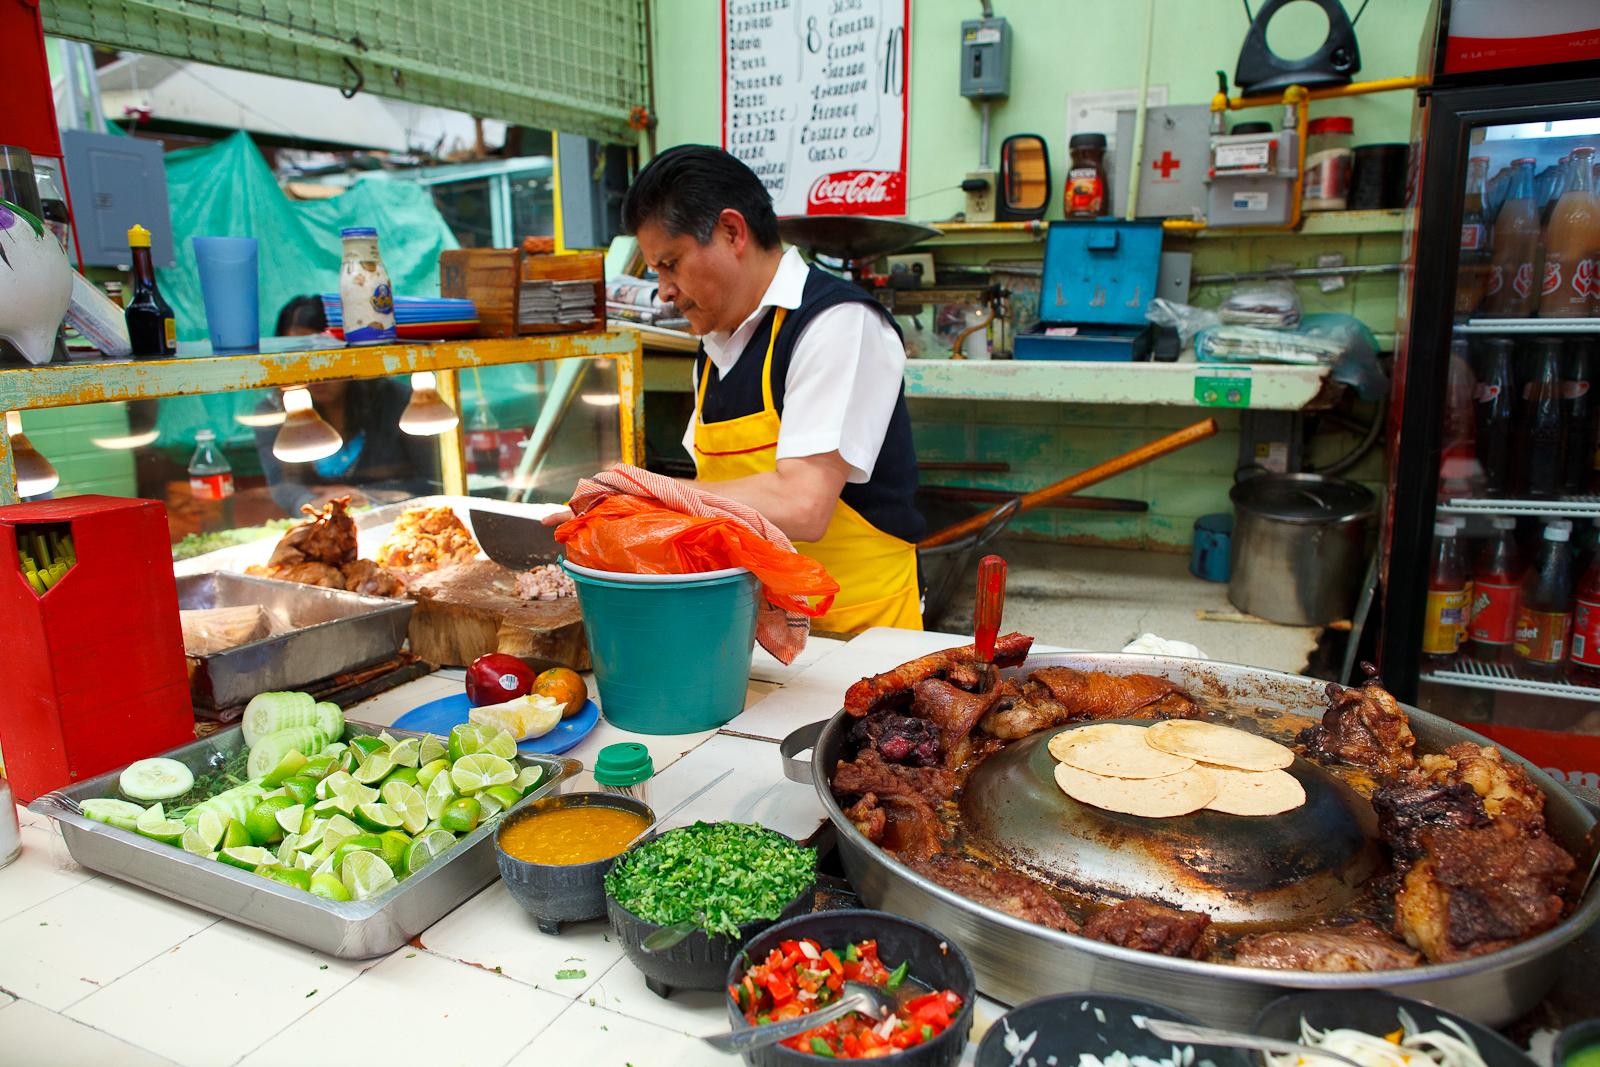 Chopping pork for carnitas